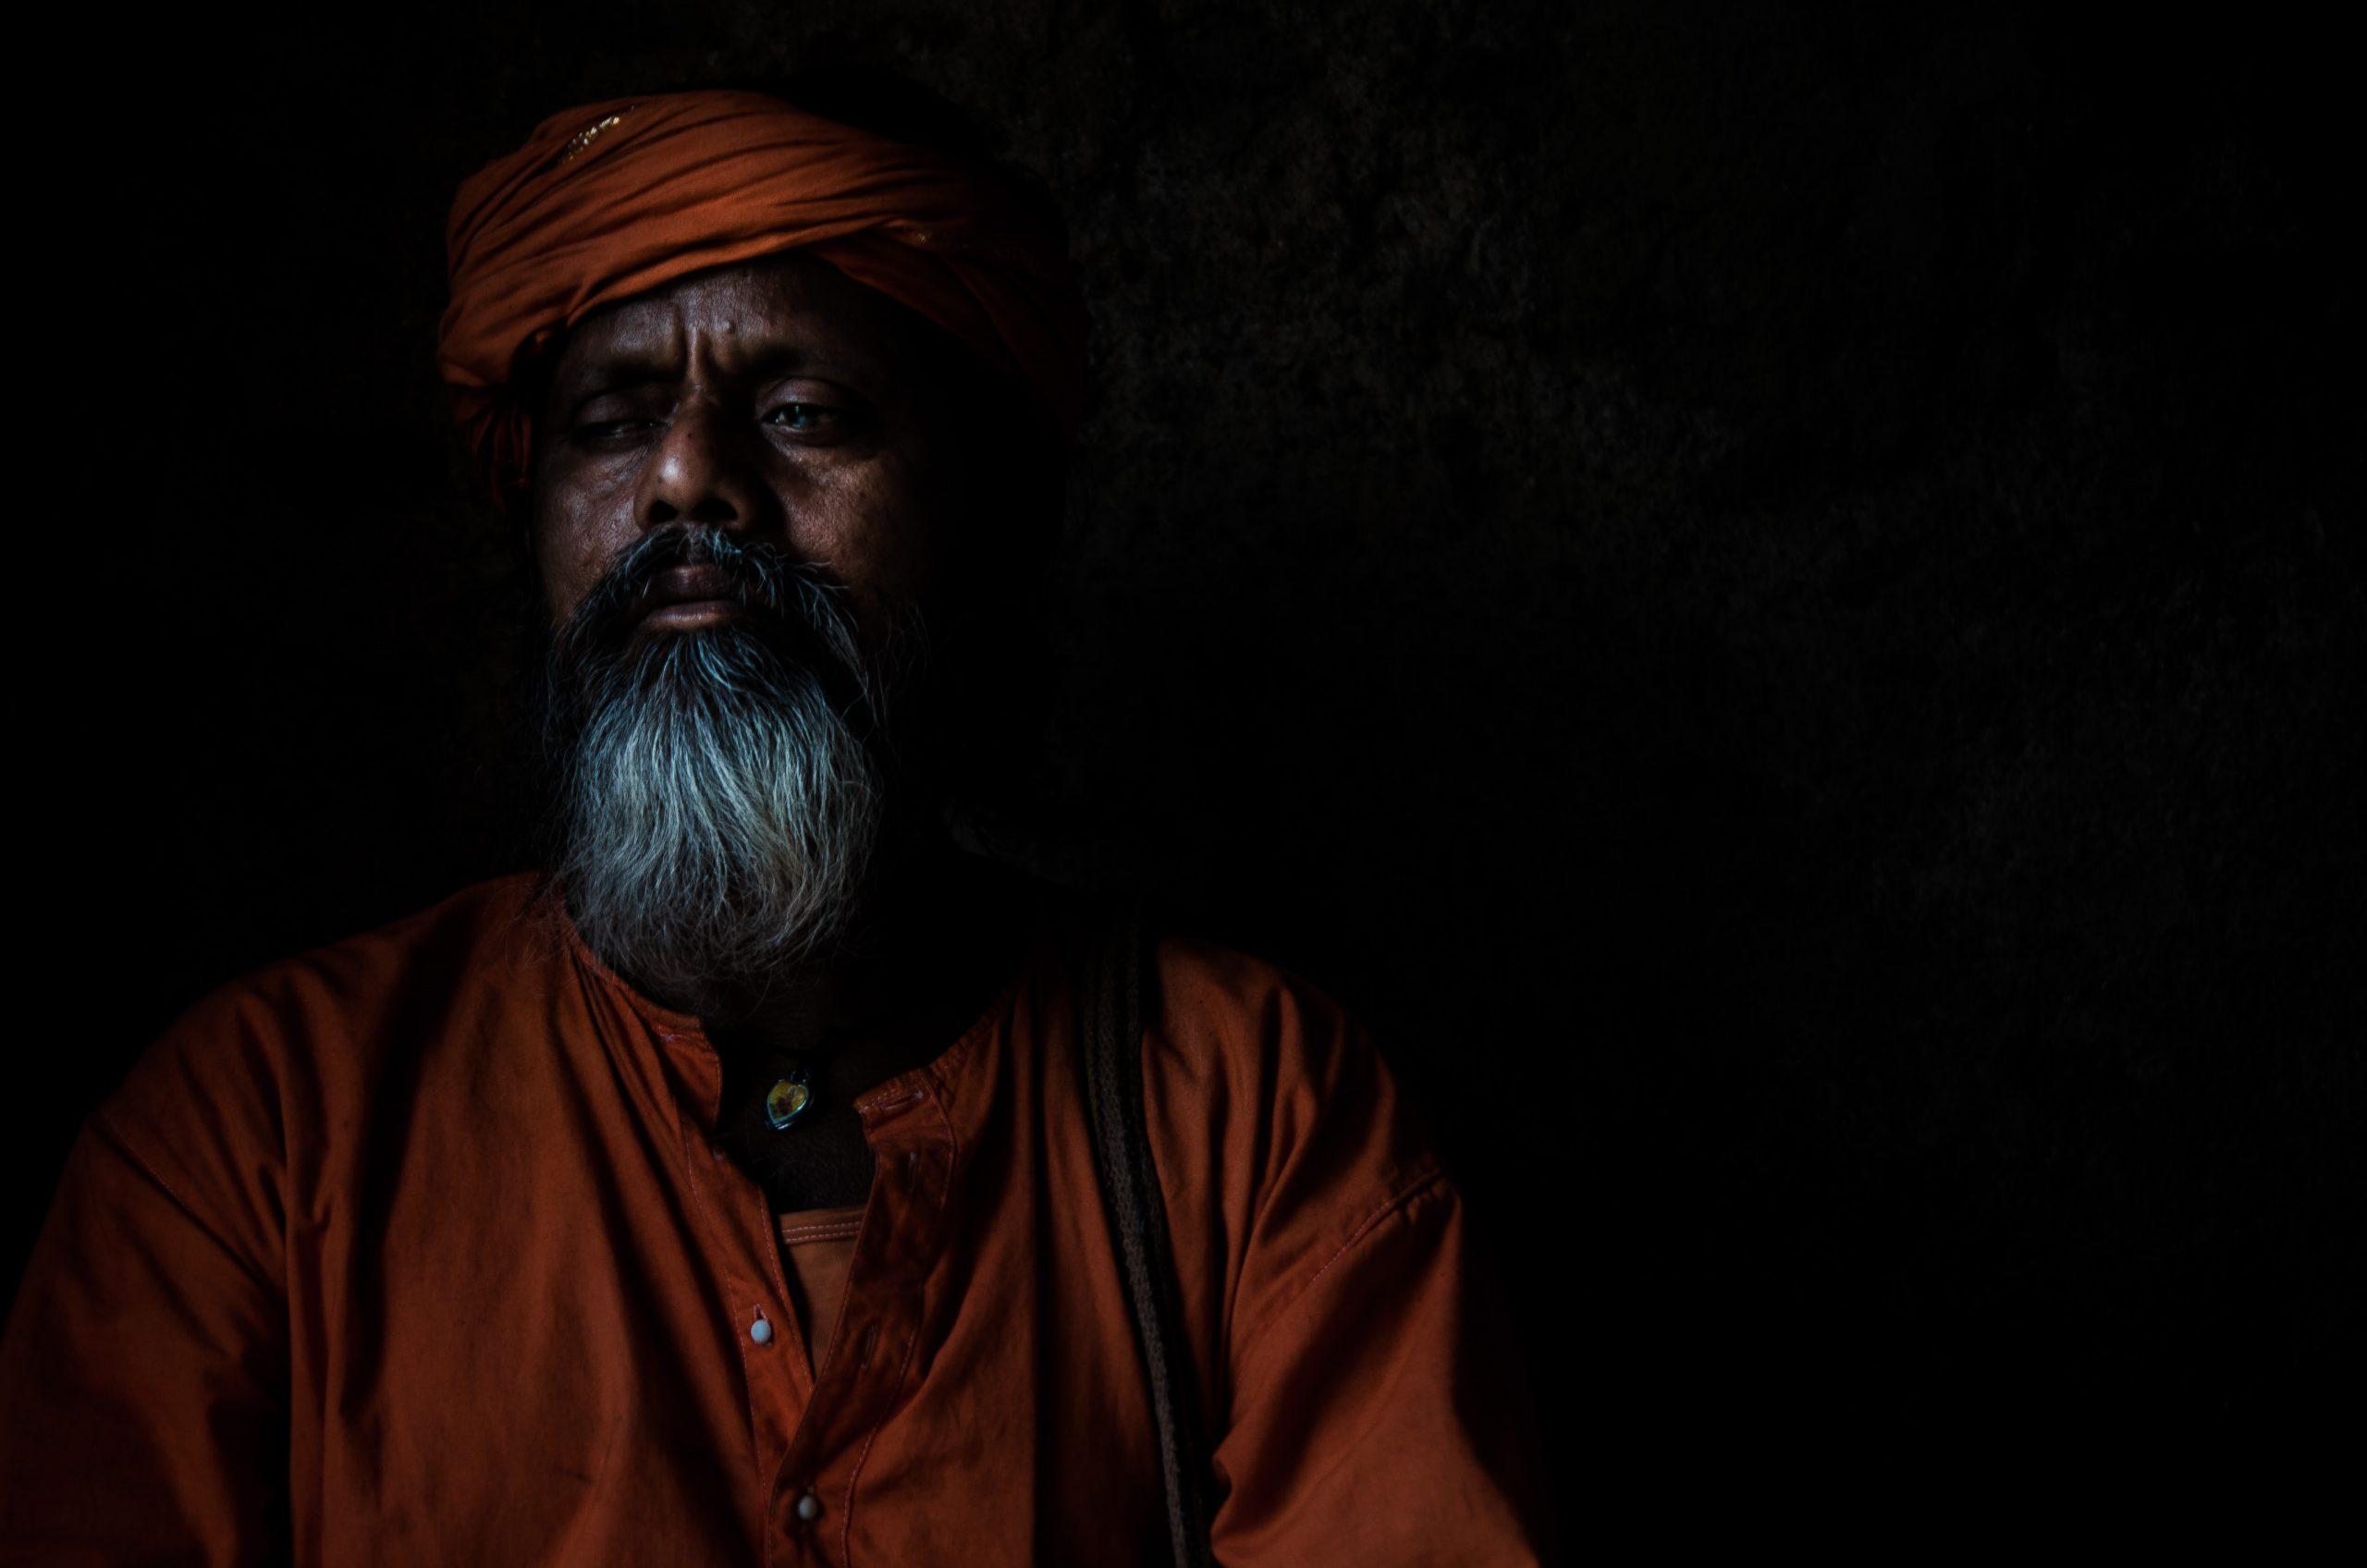 viaje fotográfico india norte